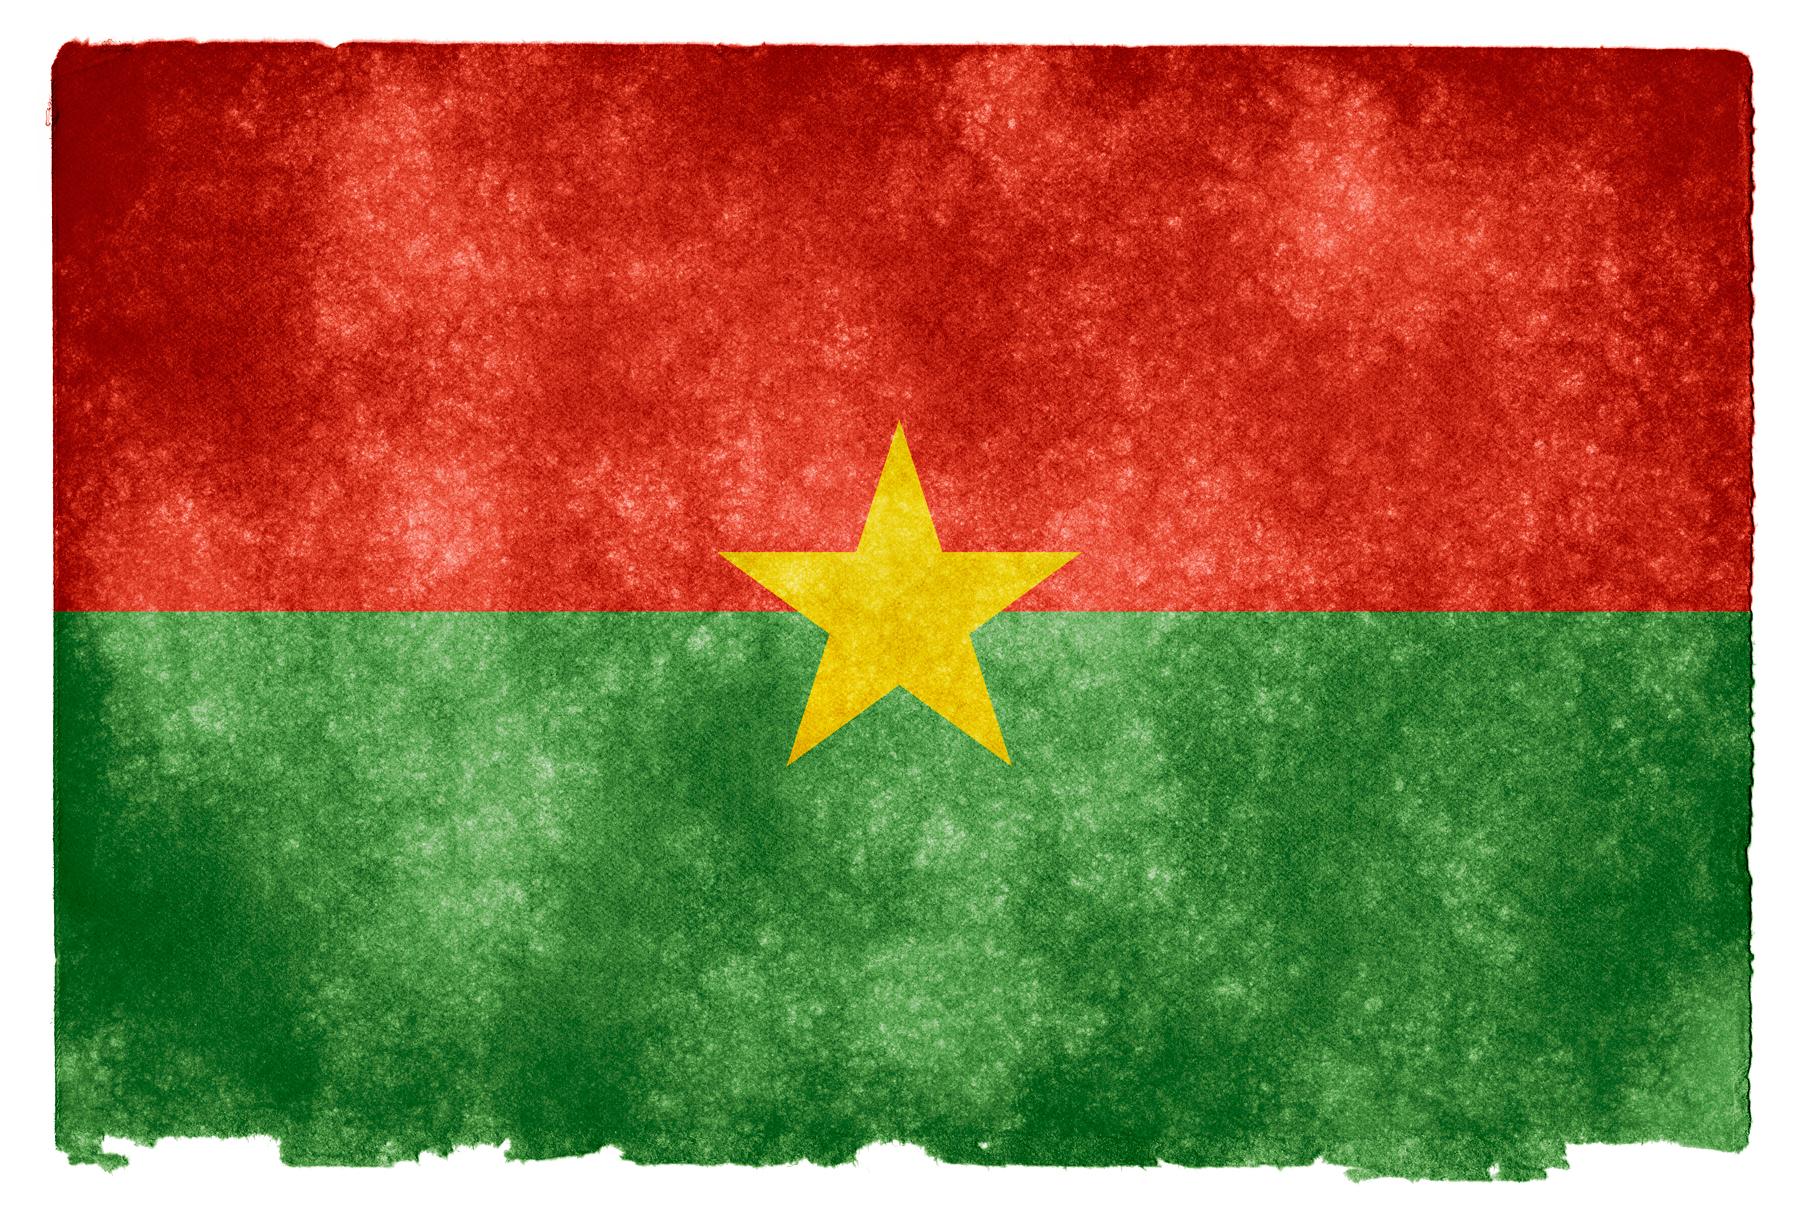 Burkina Faso Grunge Flag, Africa, Sheet, Page, Paper, HQ Photo